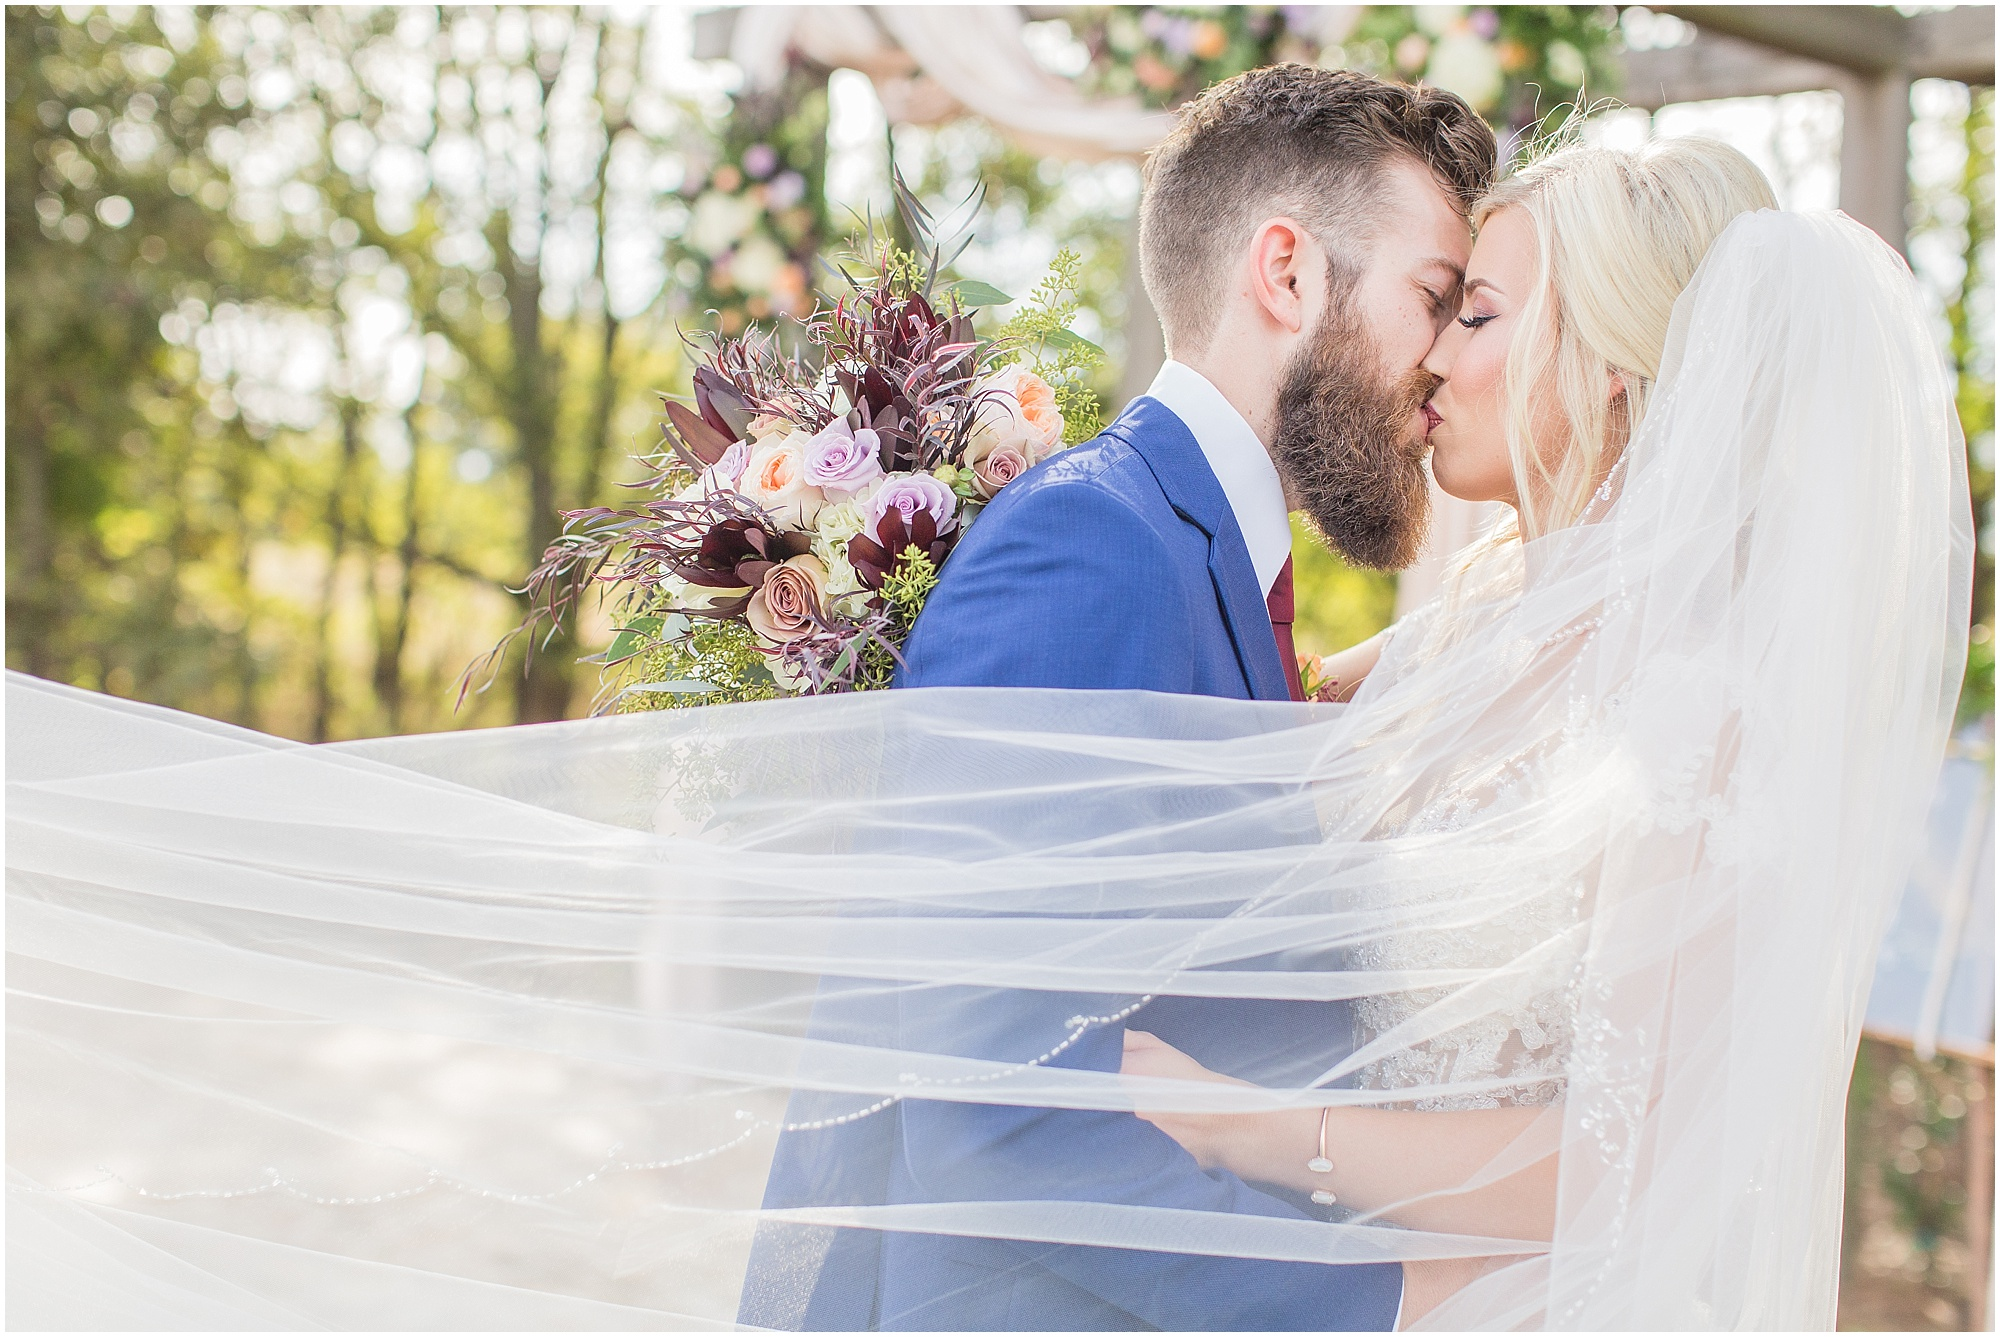 fall-wedding-bridlewood-of-madison-mississippi_0026.jpg